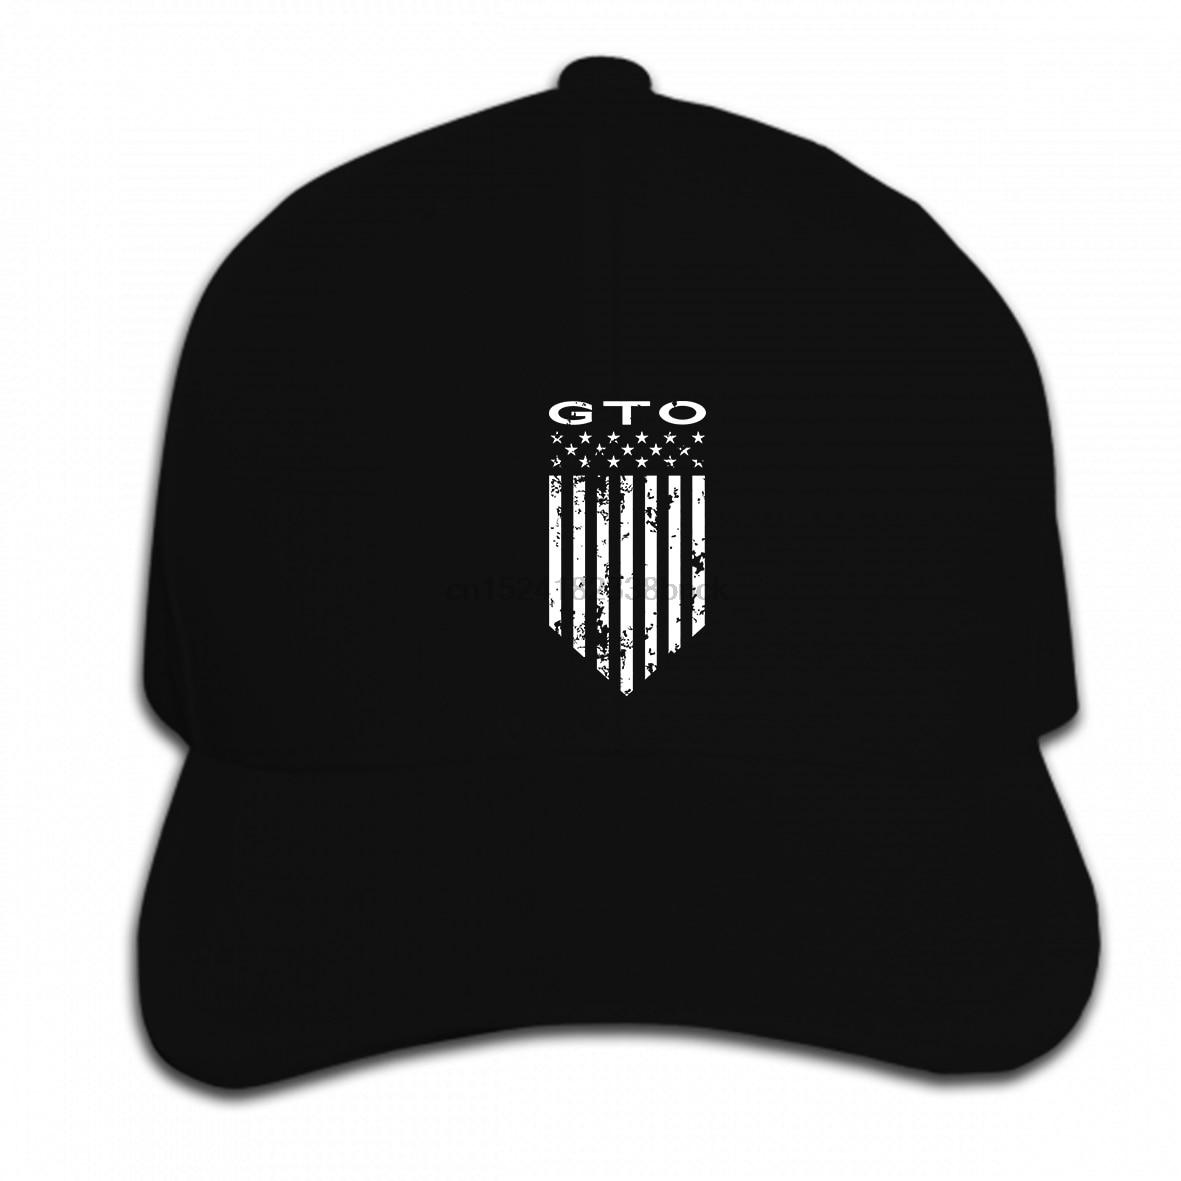 Imprimir personalizado gorra de béisbol Hip Hop Cool Mens Pontiac Gto Músculo americano Pontiac hombres s sombrero pico Cap